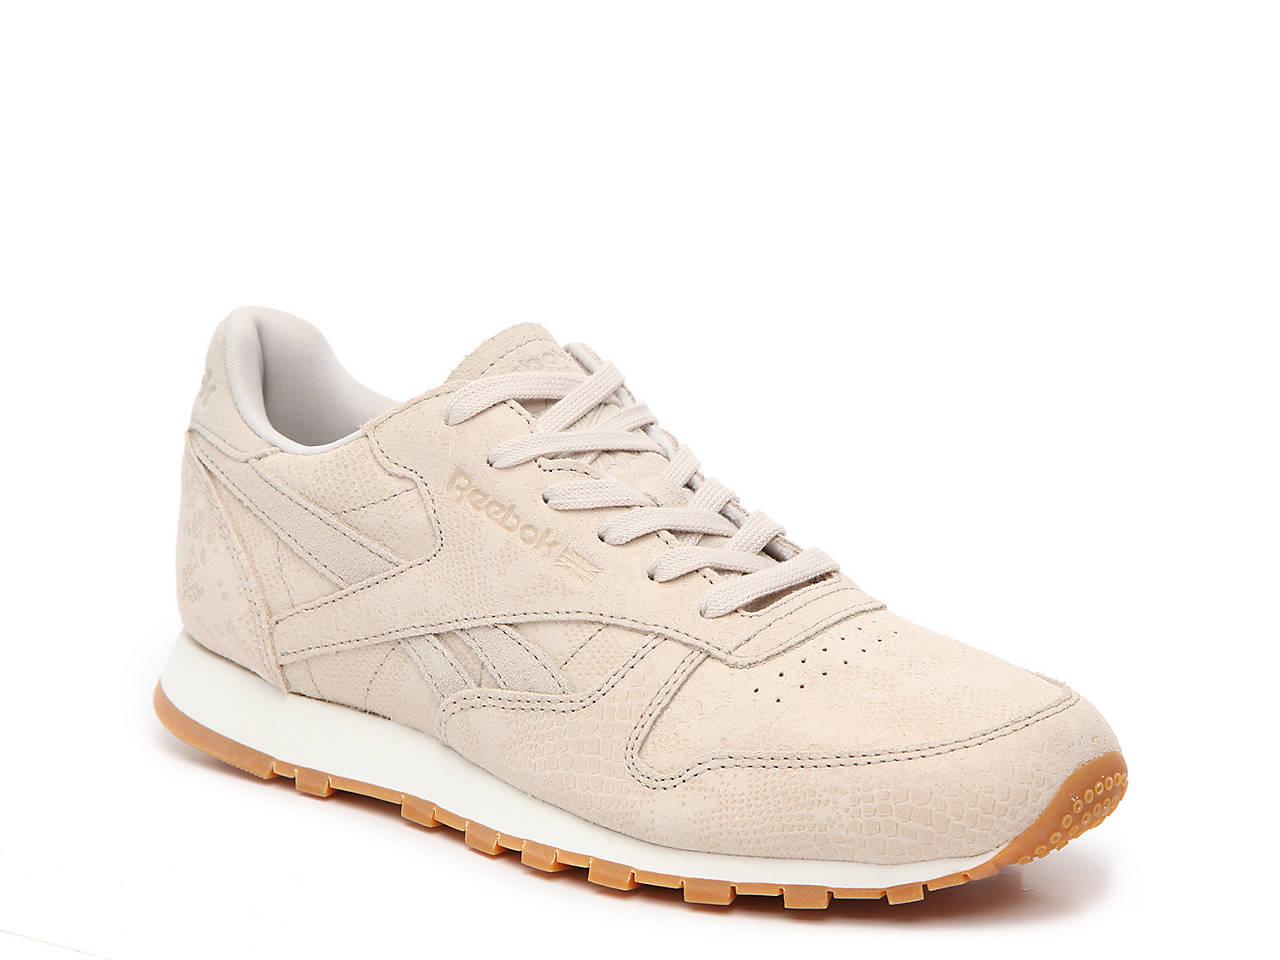 f93508904ae Reebok Classic Leather Clean Exotics Sneaker - Women s Women s Shoes ...